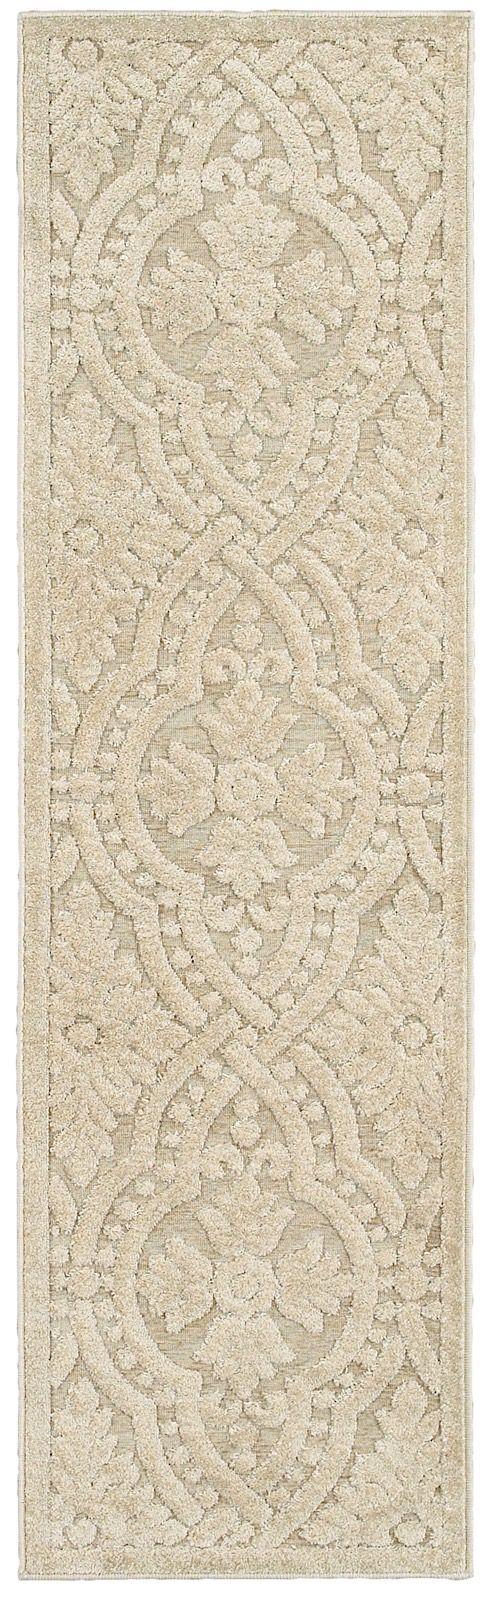 oriental weavers hampton traditional area rug collection